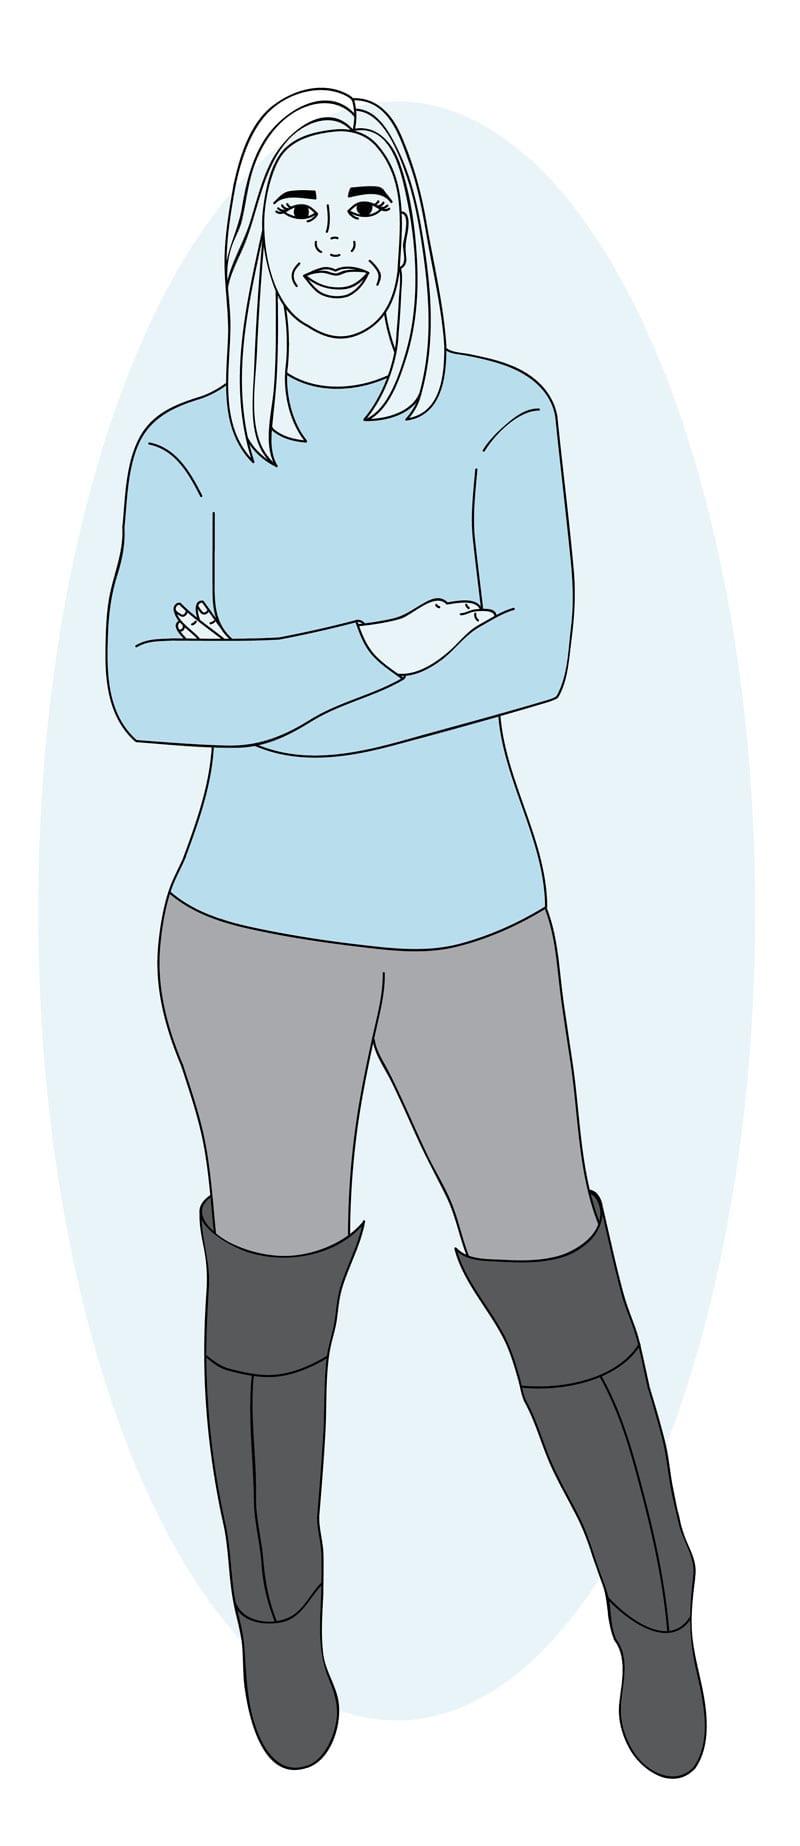 K9 Digital Marketing Team Member Cartoon - Megan